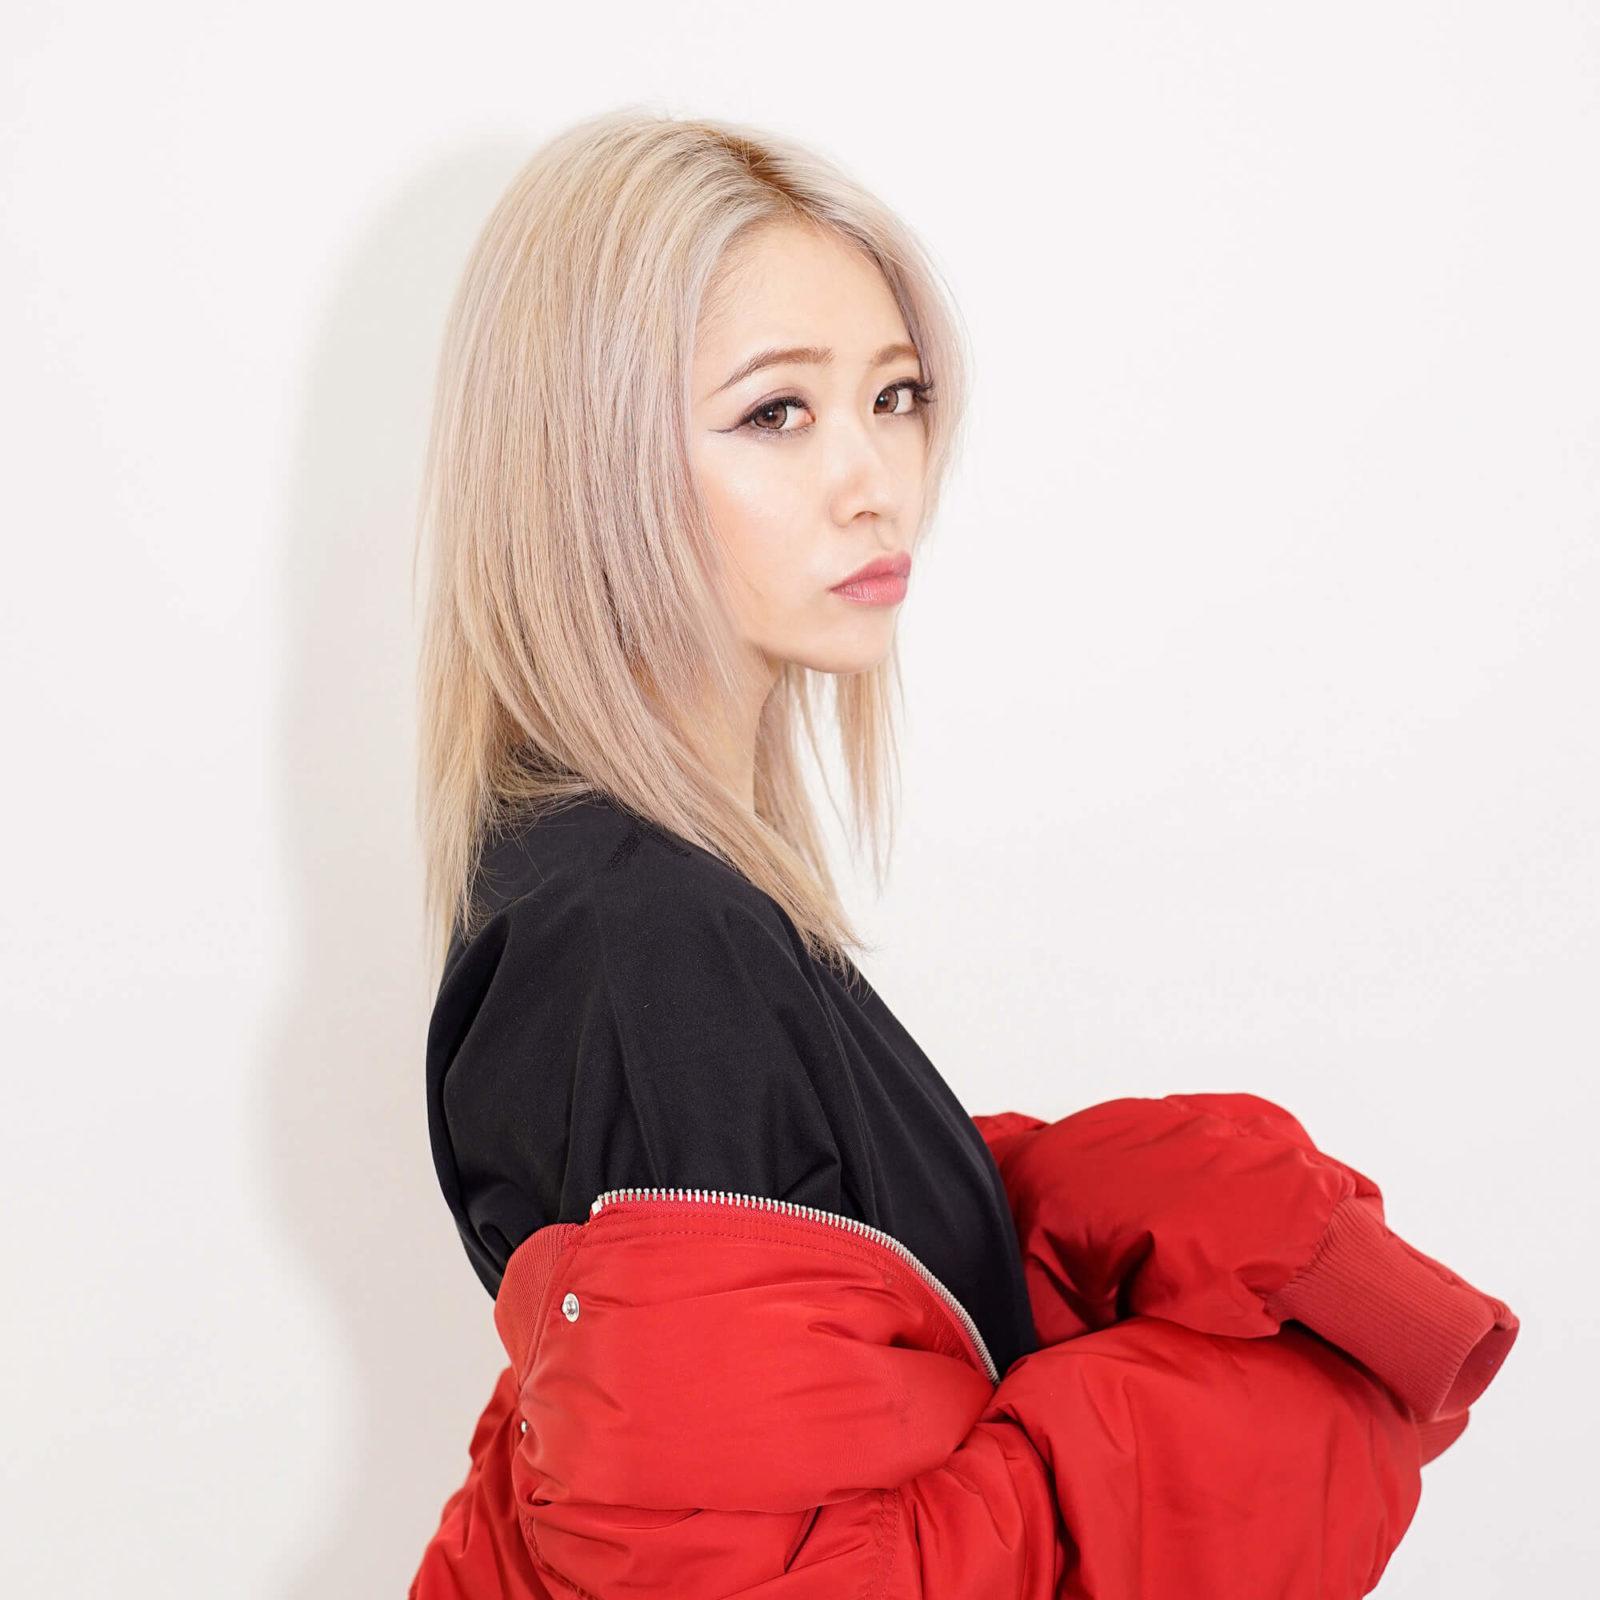 ATOM TOKYOの人気女性DJ KEIKOが、ファン待望の4枚目のシングルをリリースサムネイル画像